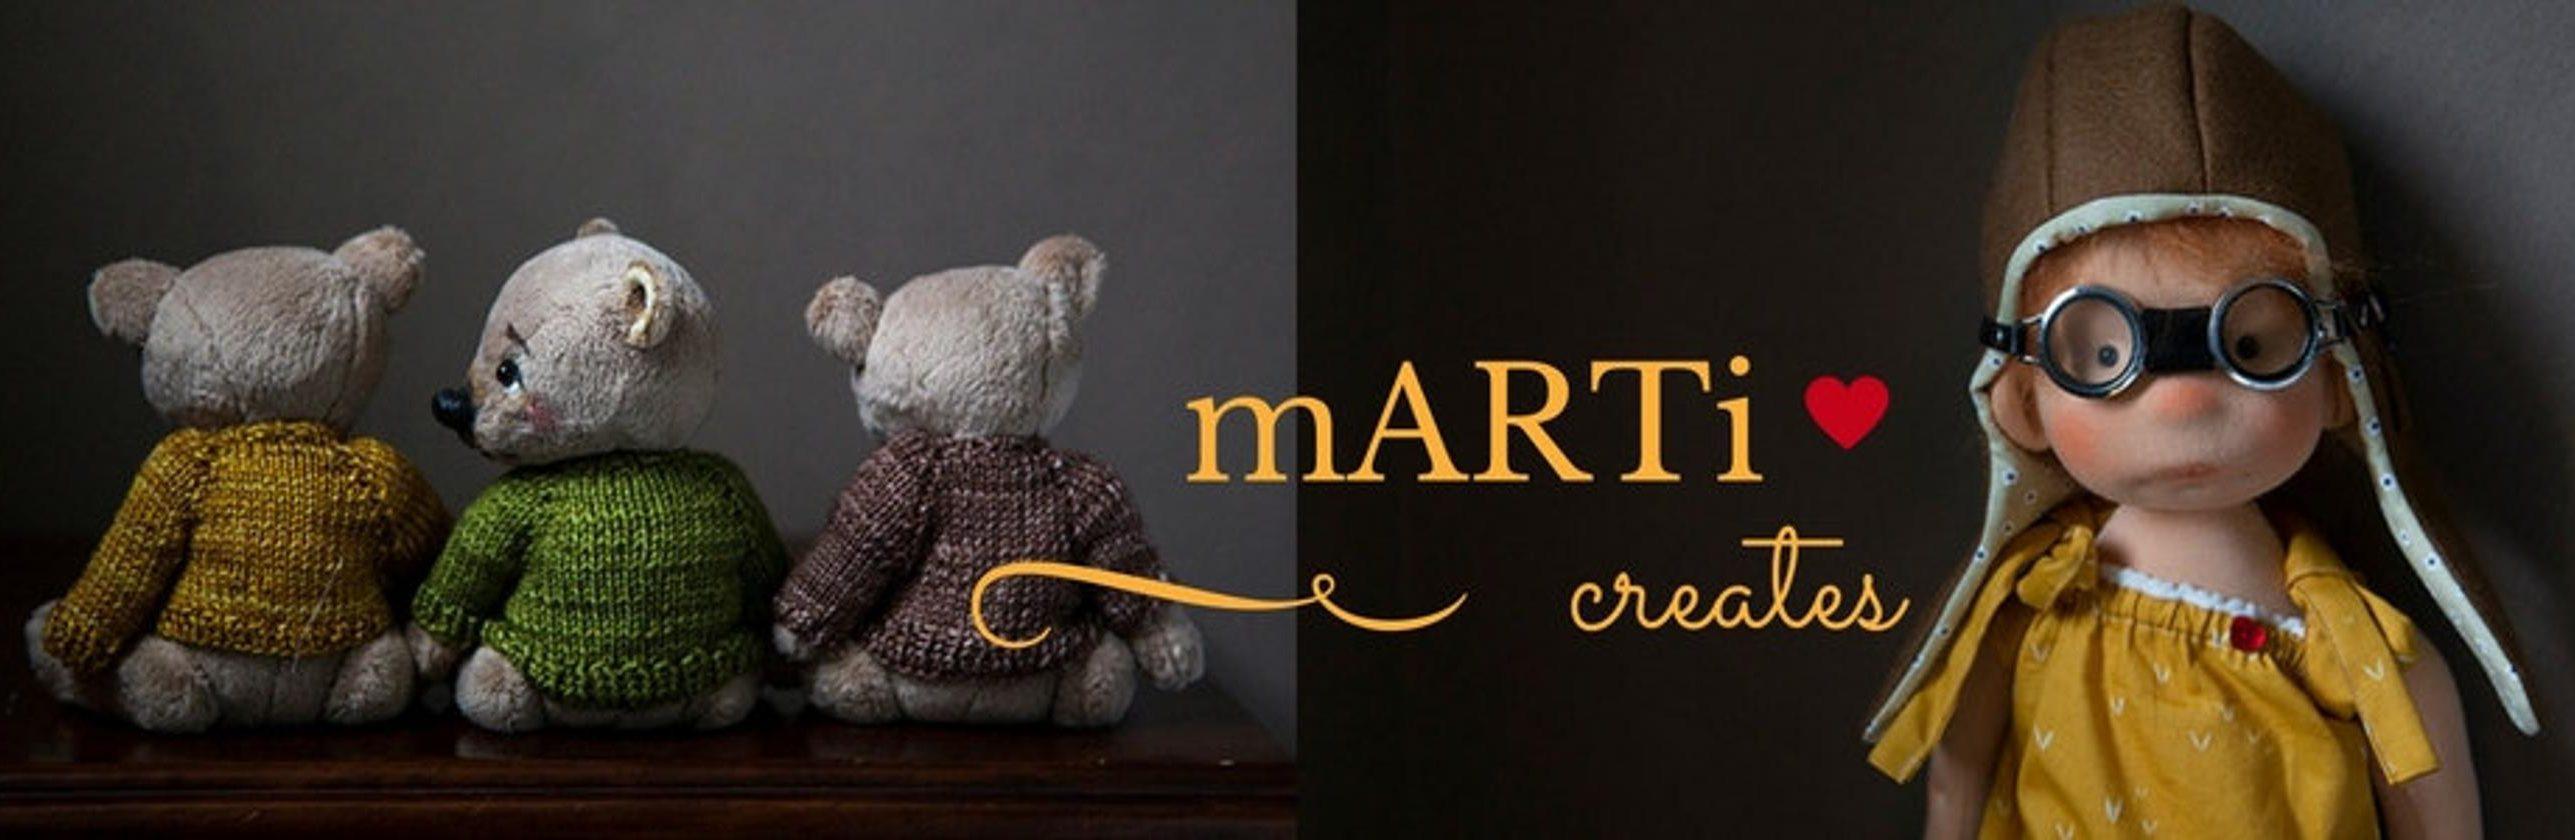 mARTi creates